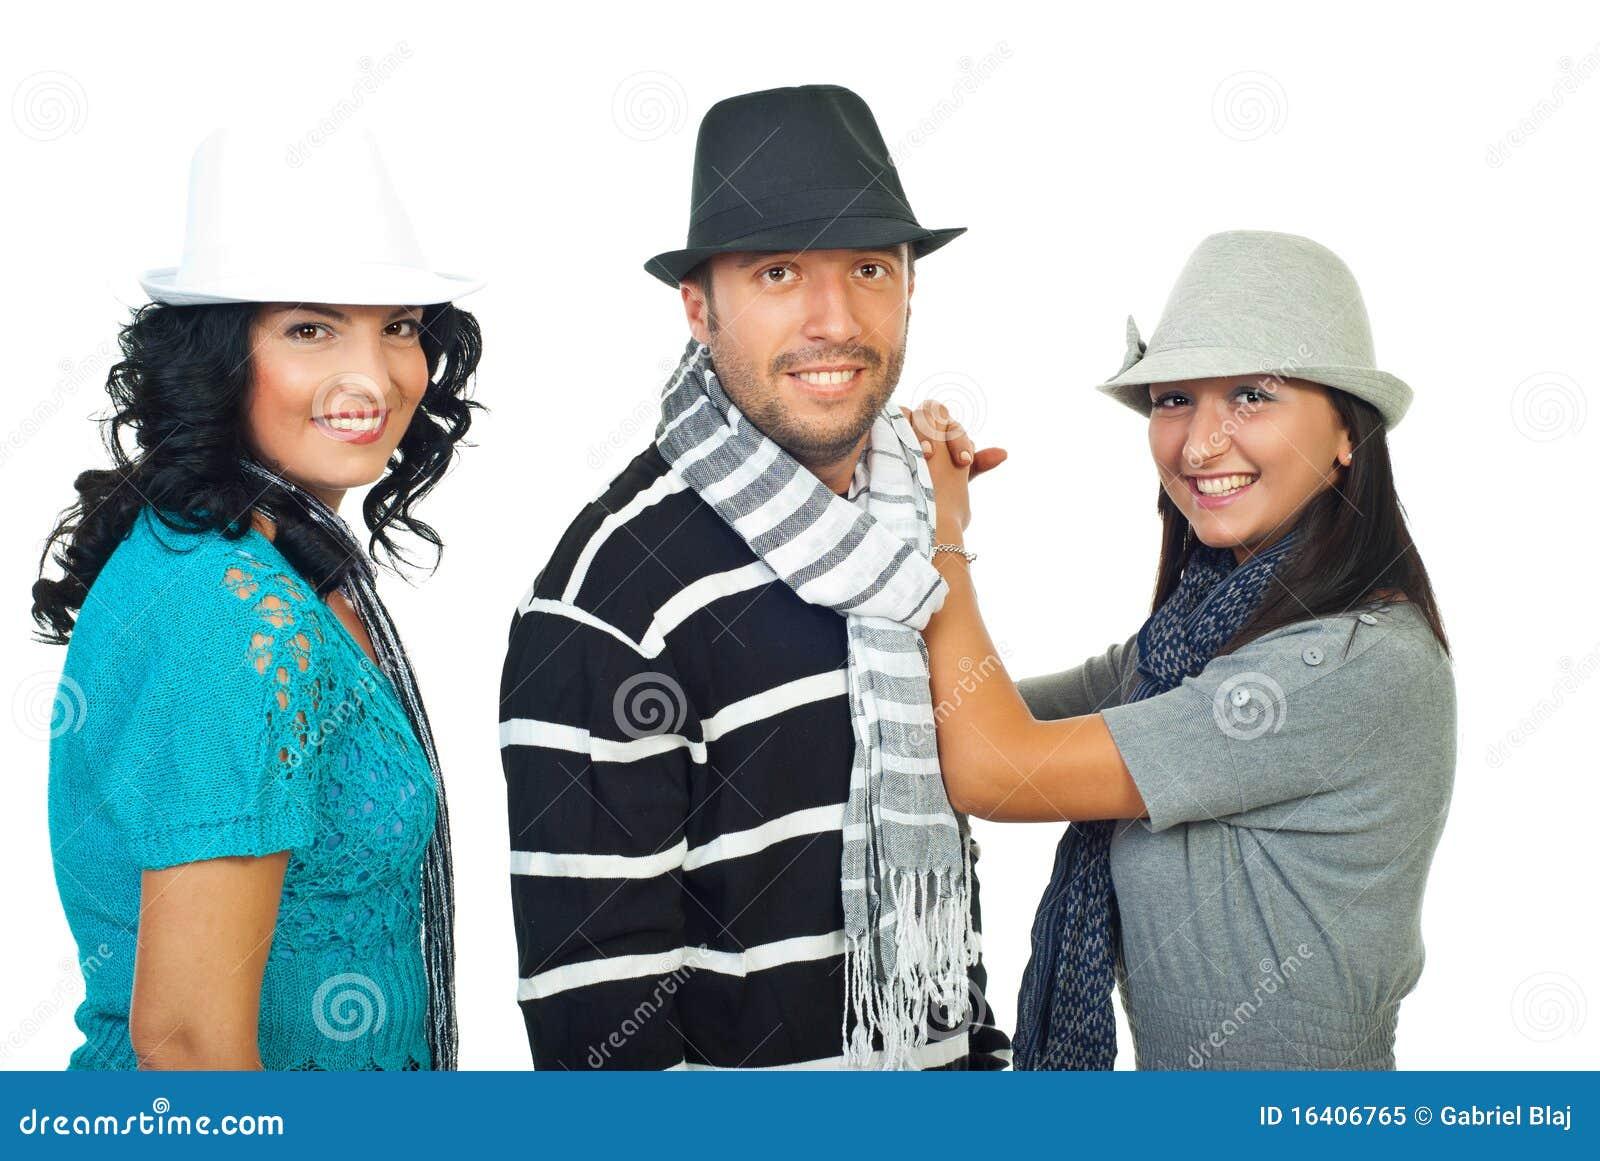 three people personas hats elegant sombreros elegantes tres royalty preview